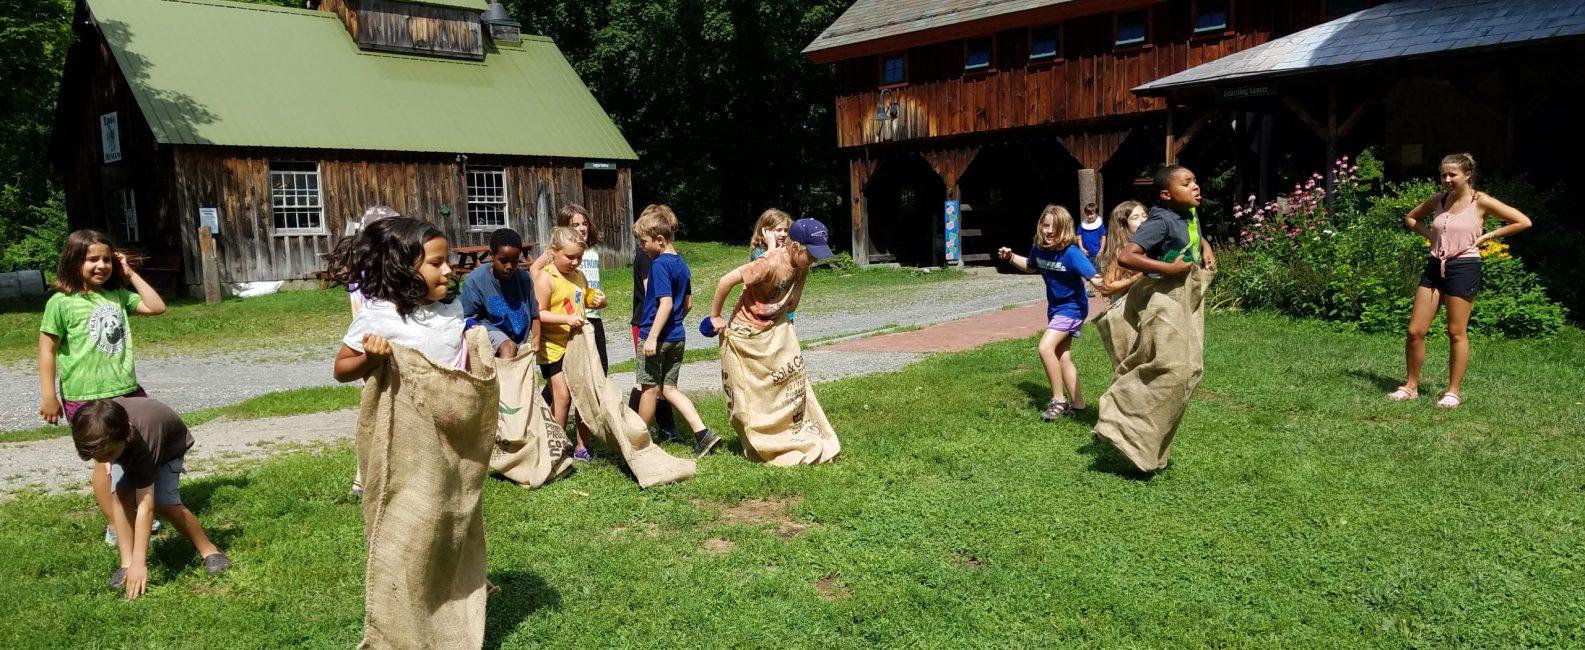 Children doing sack races.